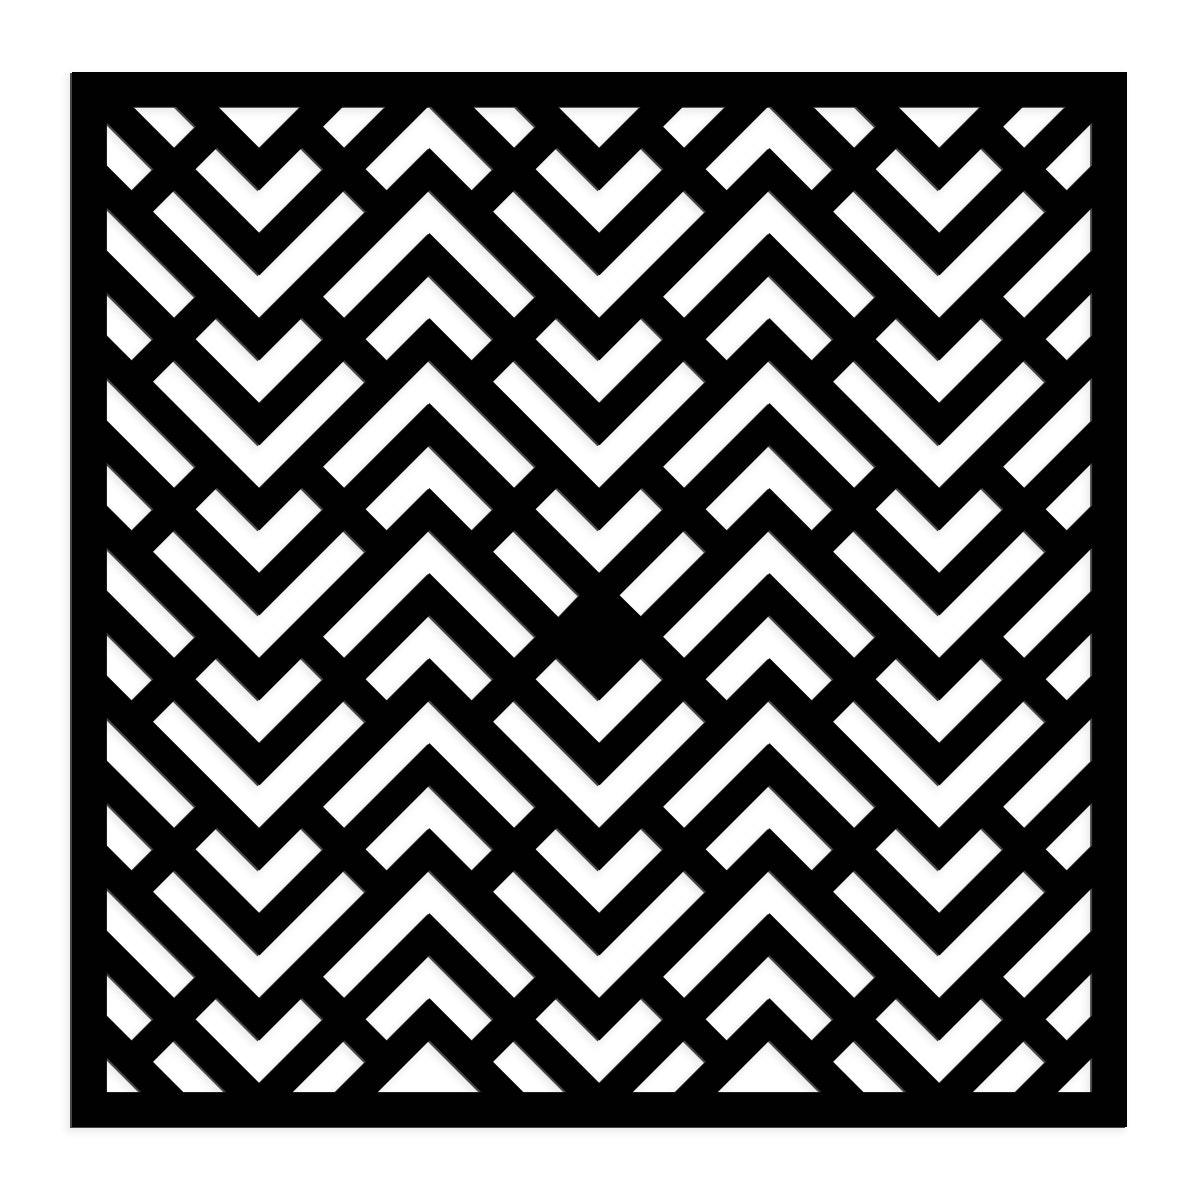 Geometrisches Muster-Wandbild (quadratisch) in schwarz